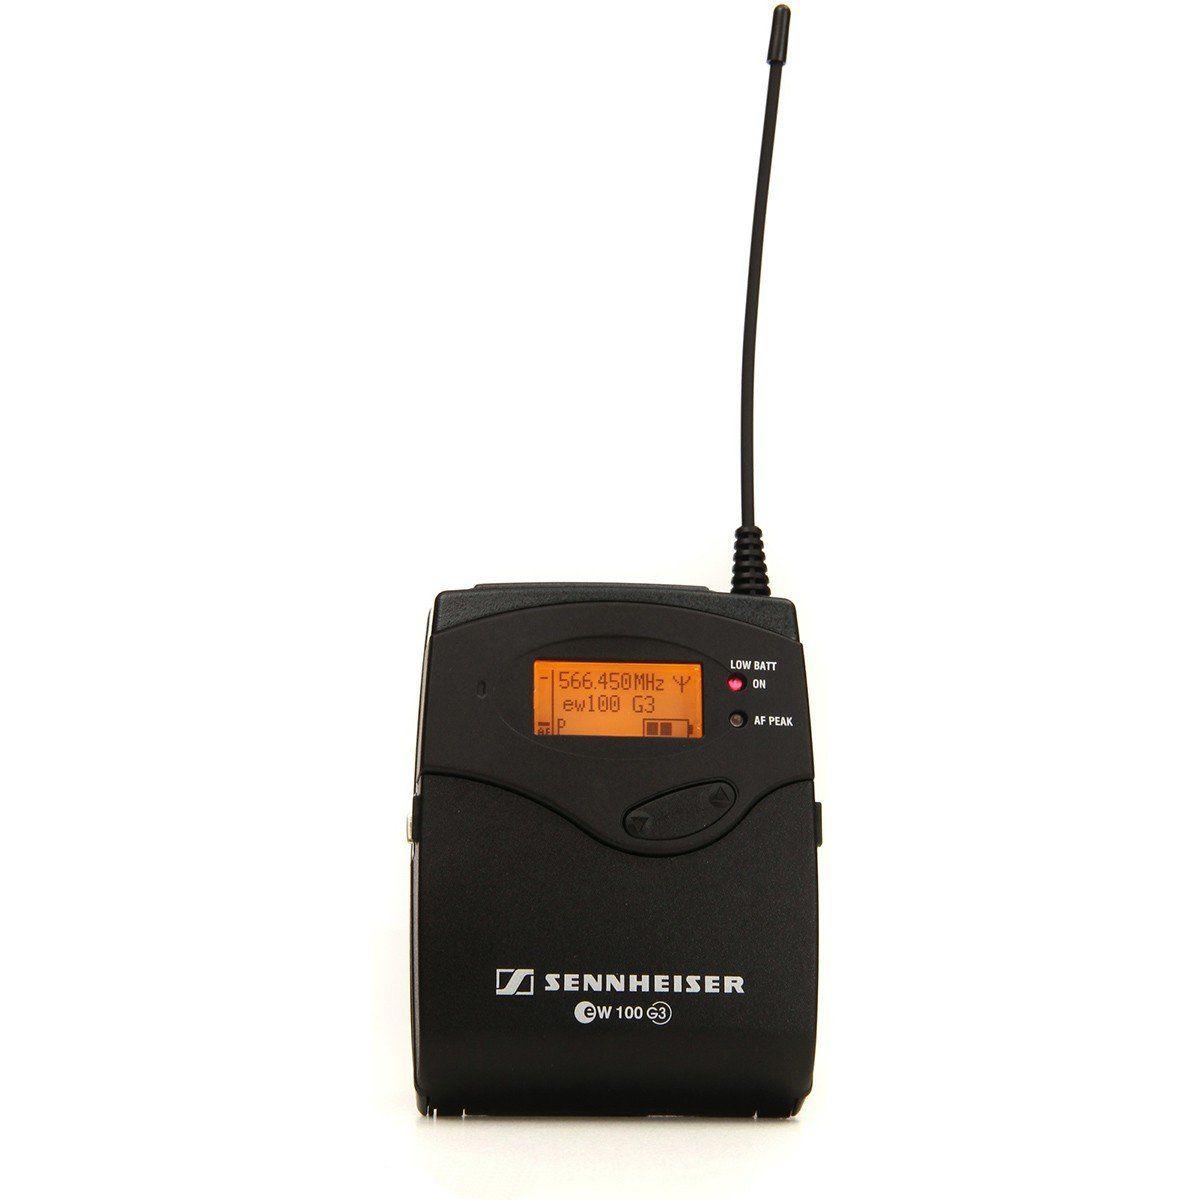 Sennheiser EW112-G3 Microfone Sennheiser EW 112-G3 para Apresentações e Palestras